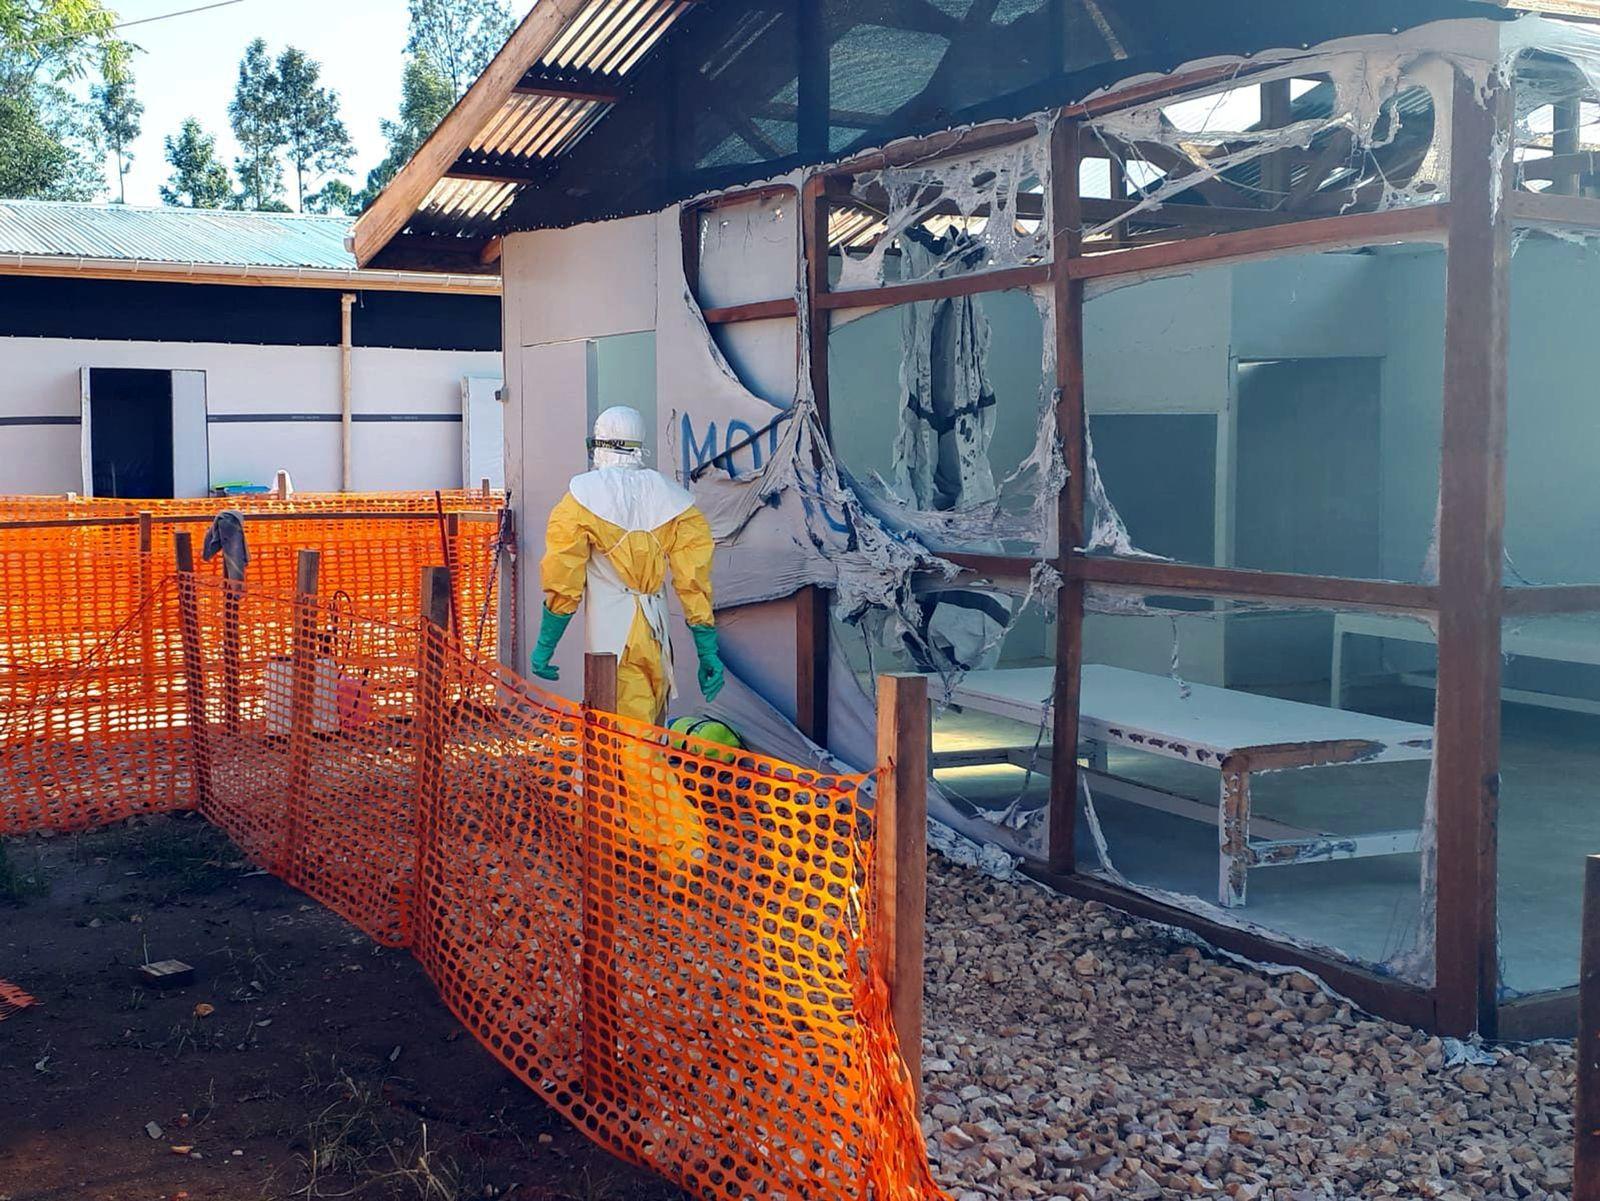 Angriff auf Ebola-Klinik